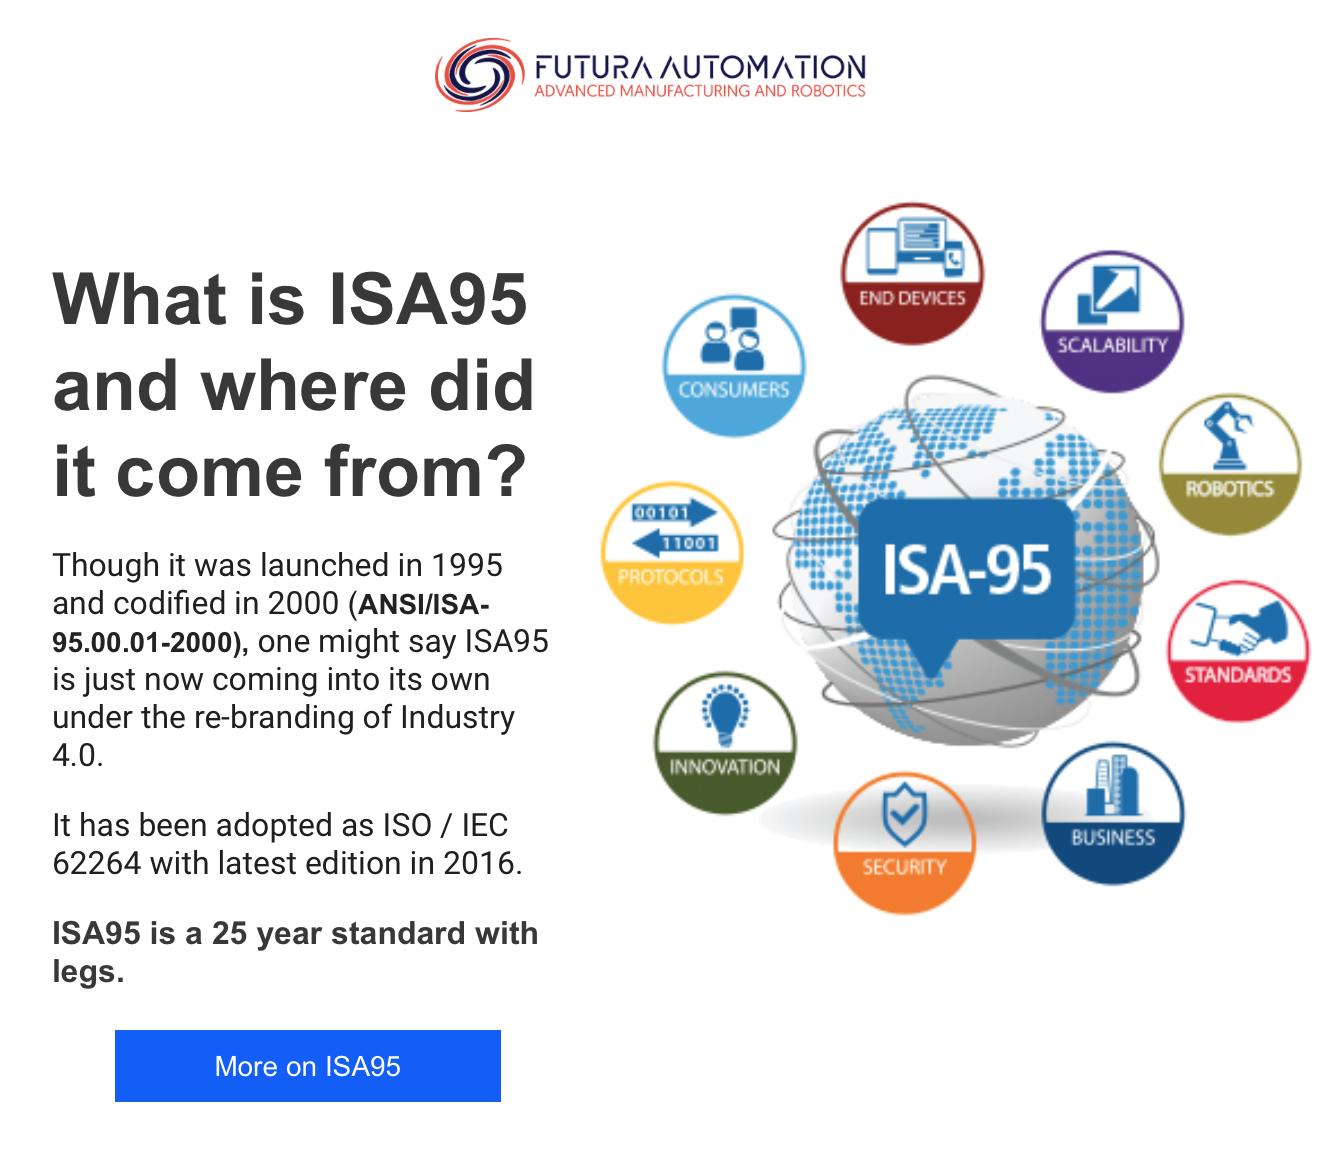 ISA95 - Futura Automation